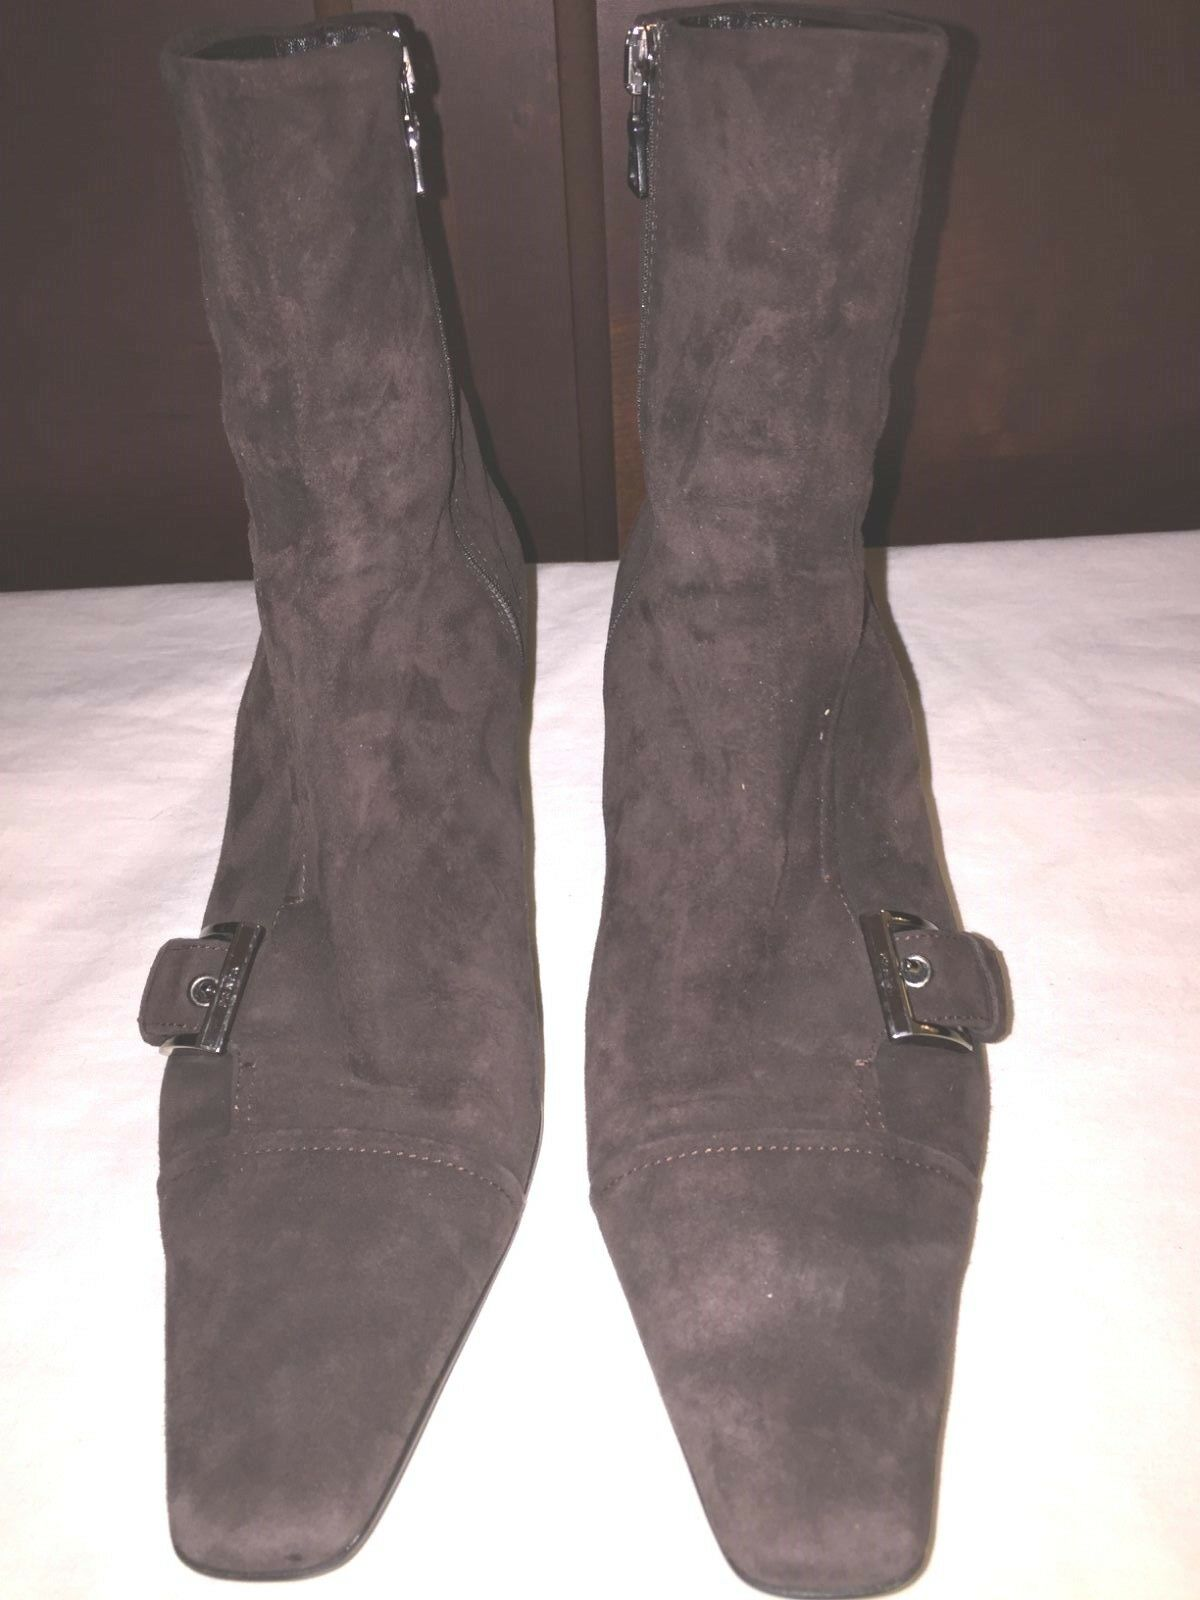 PRADA Suede Braun Suede PRADA Ankle Zip Stiefel Sz  Euro 37.5 / US 6.5 - 7 9fa7b9